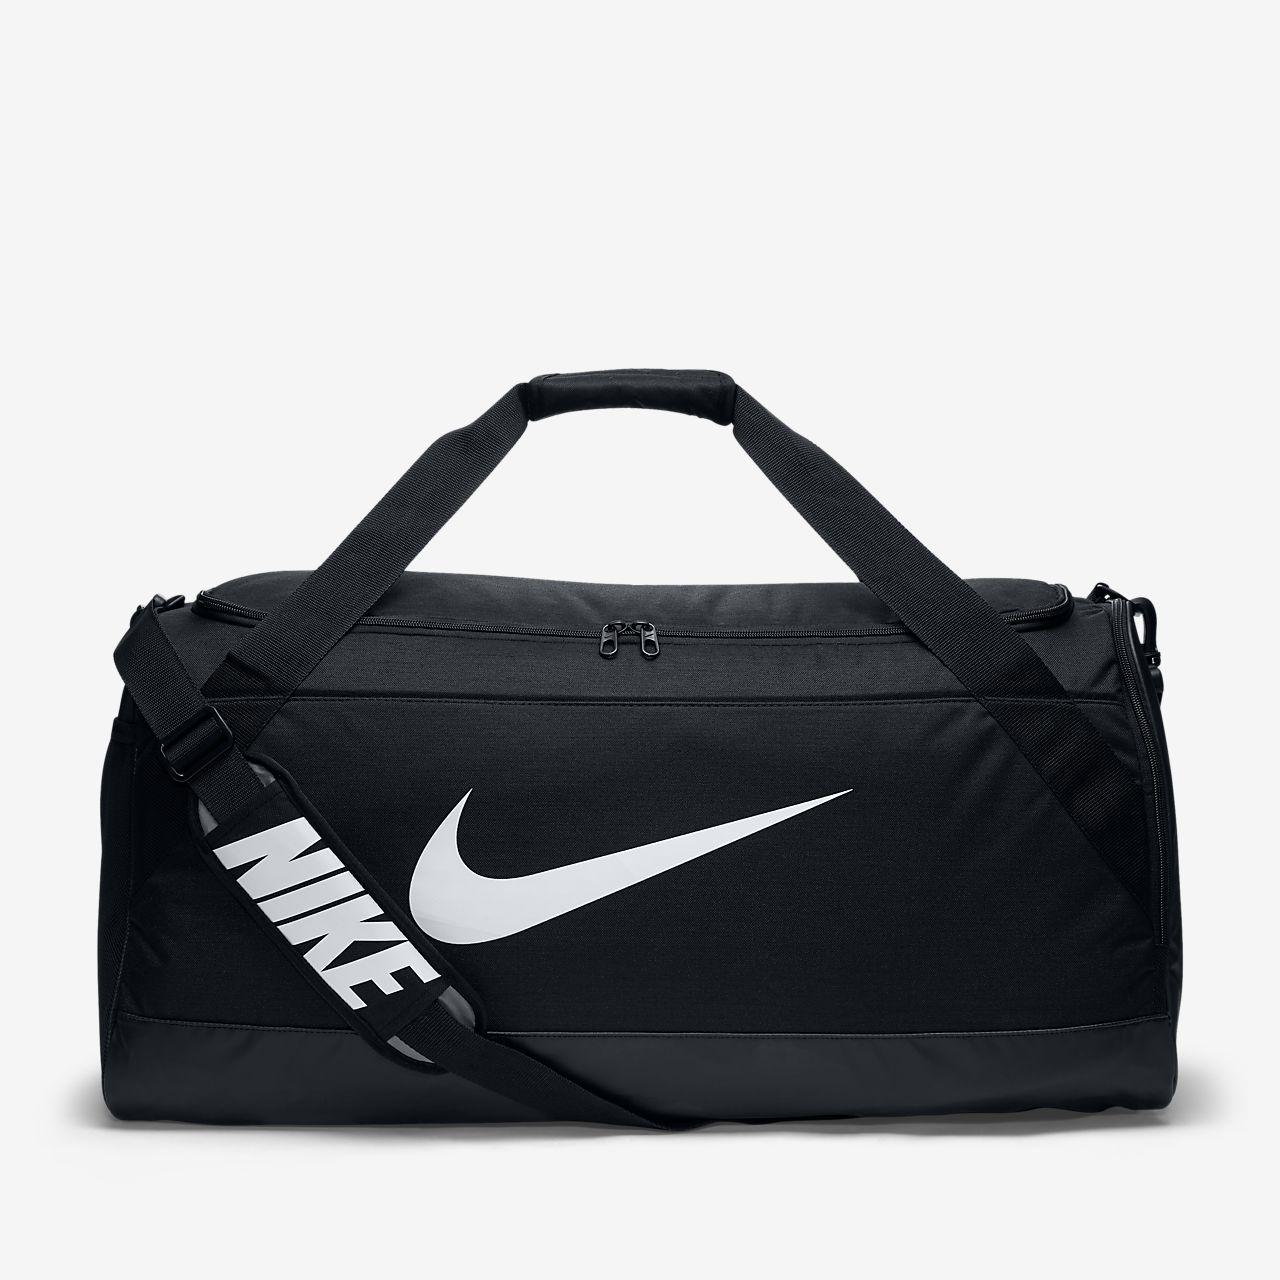 43142bbe73 Nike Brasilia Duffel Bag Extra Small